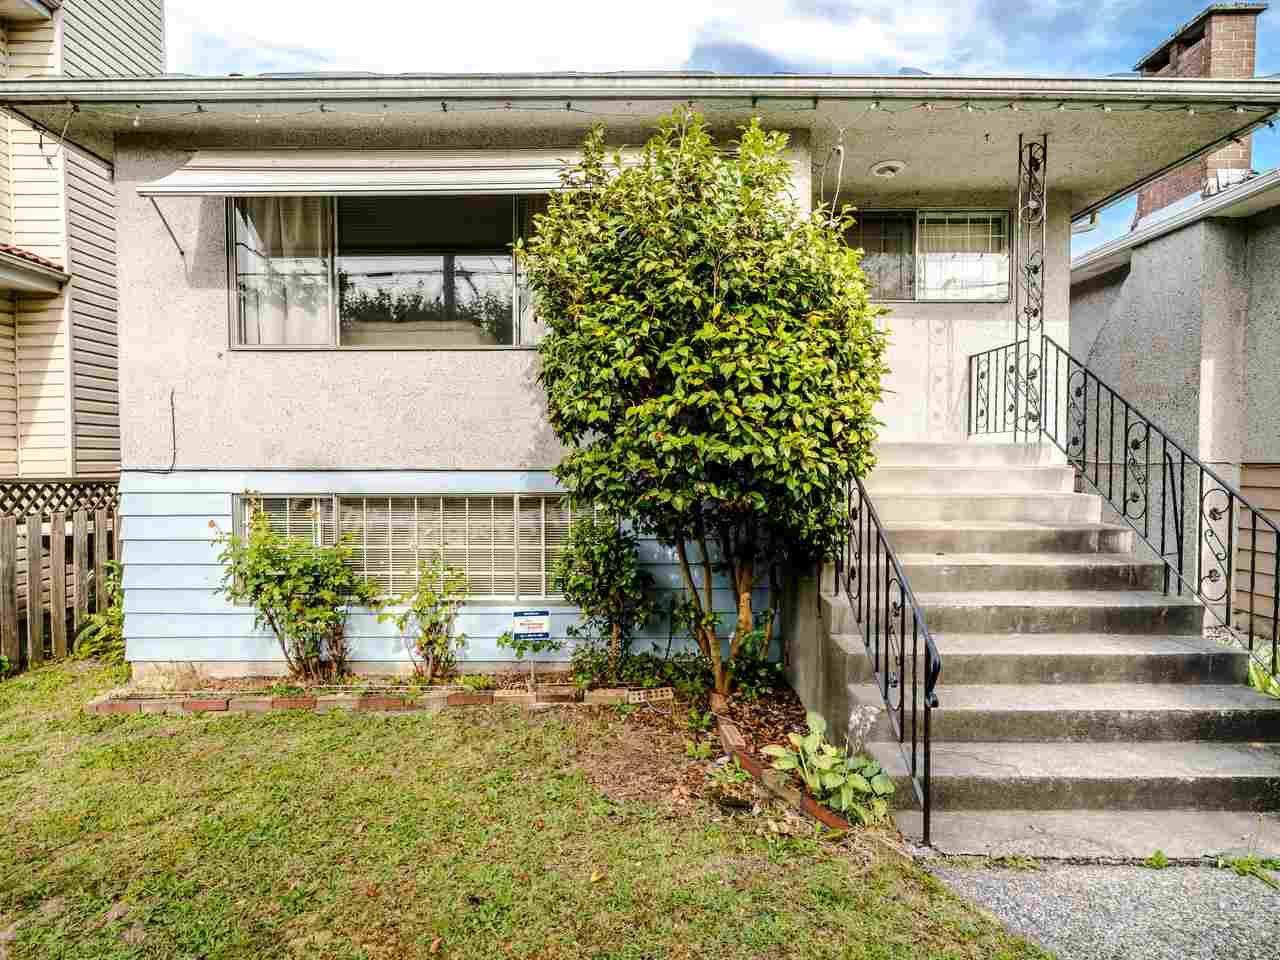 Main Photo: 5904 BERKELEY Street in Vancouver: Killarney VE House for sale (Vancouver East)  : MLS®# R2481103